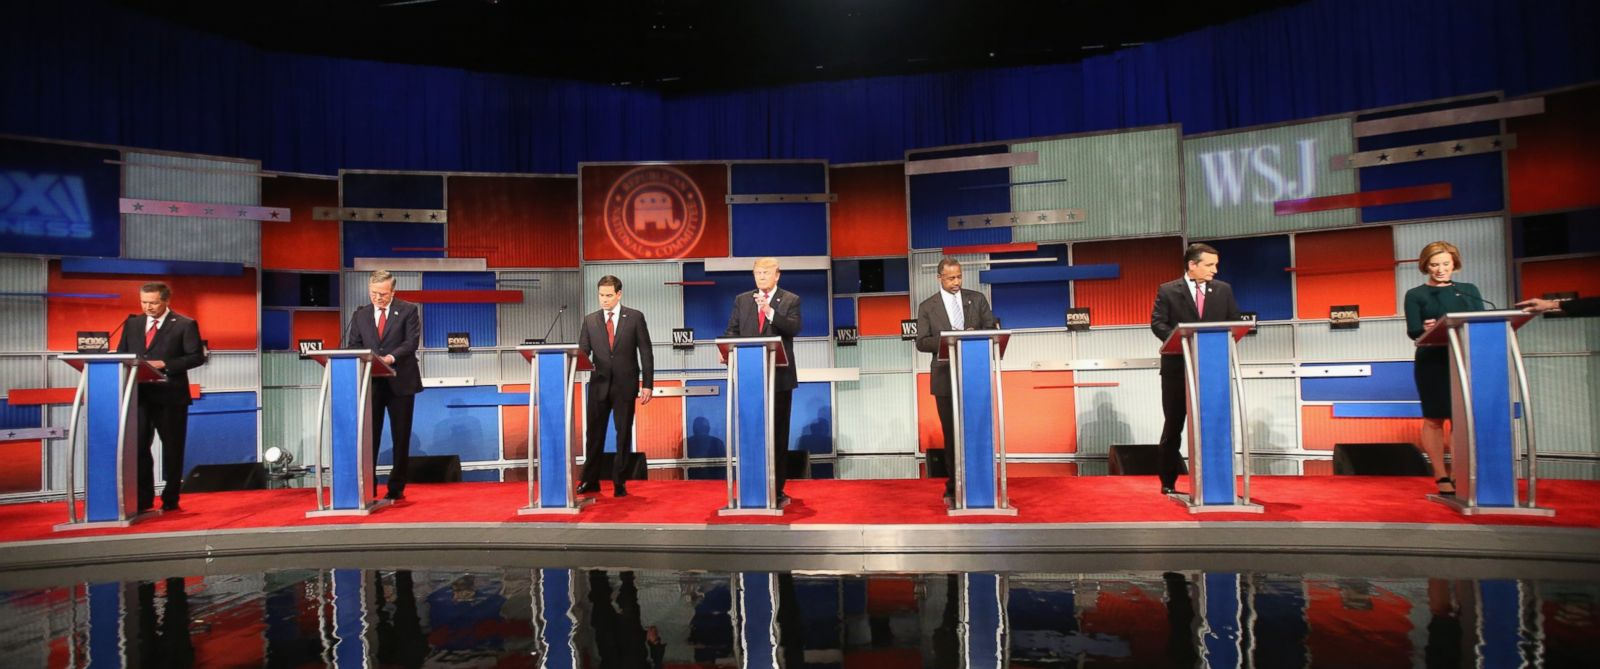 PHOTO: Presidential candidates Ohio Governor John Kasich , Jeb Bush, Sen. Marco Rubio , Donald Trump, Ben Carson, Ted Cruz , and Carly Fiorina take the stage in the Republican Presidential Debate, Nov. 10, 2015 in Milwaukee, Wisconsin.